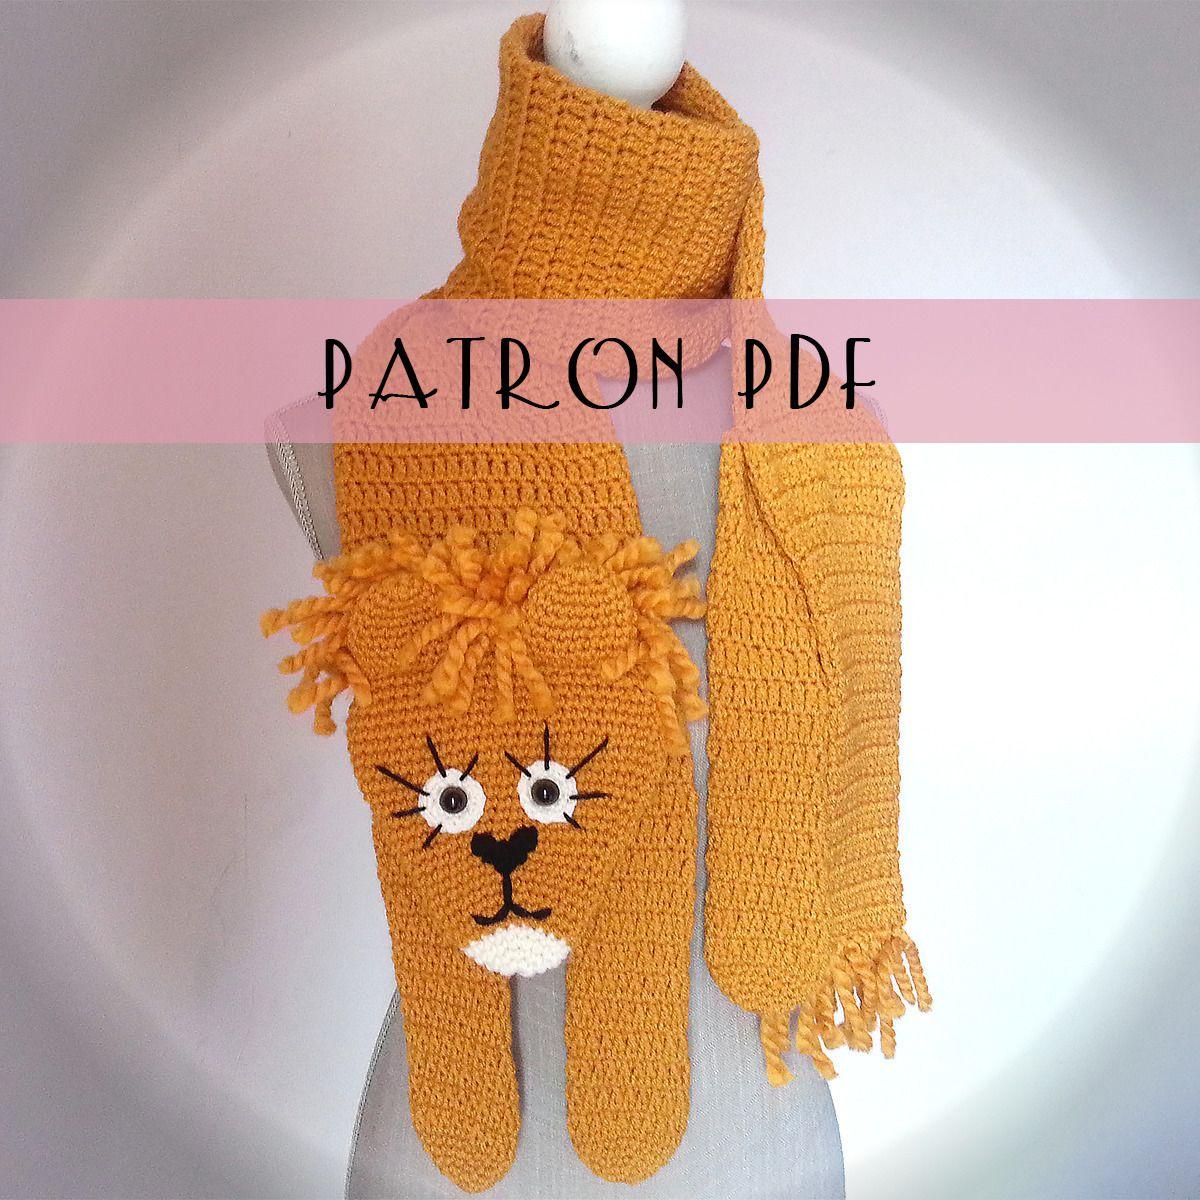 Patron écharpe lion au crochet   patron PDF   anglais et français   DIY    chunky crochet lion scarf pattern b5bcffbff7f